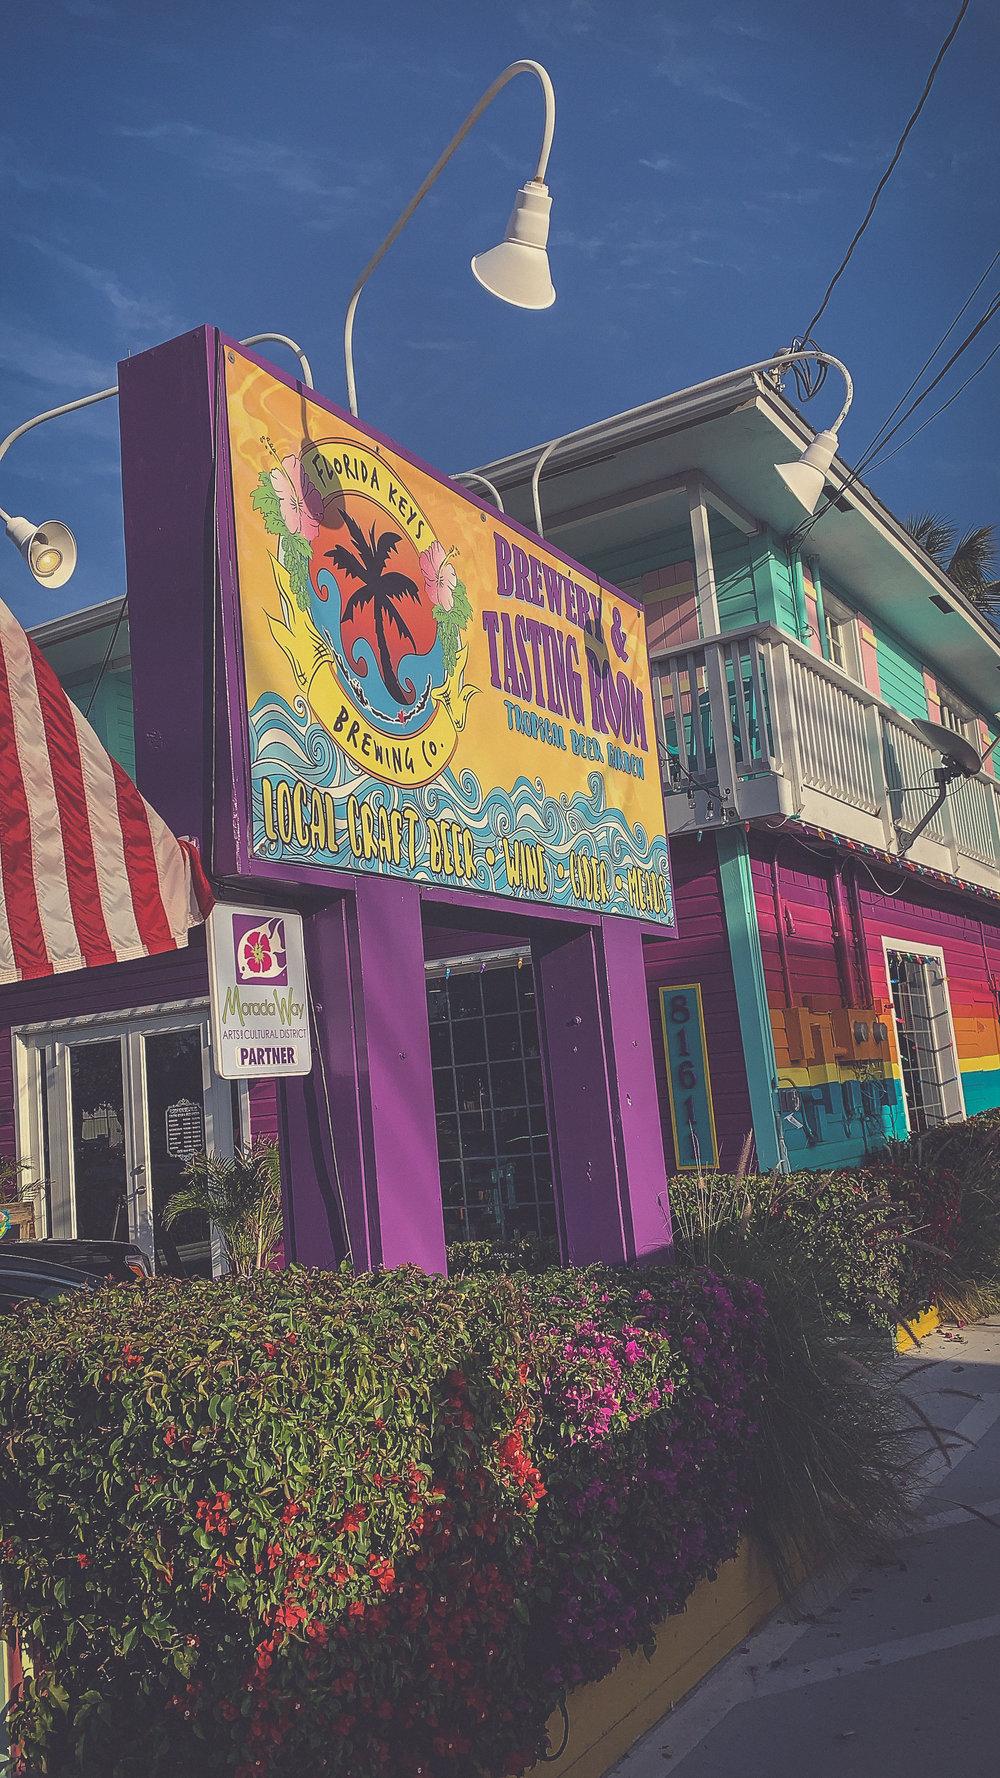 Florida Keys Brewing Co.